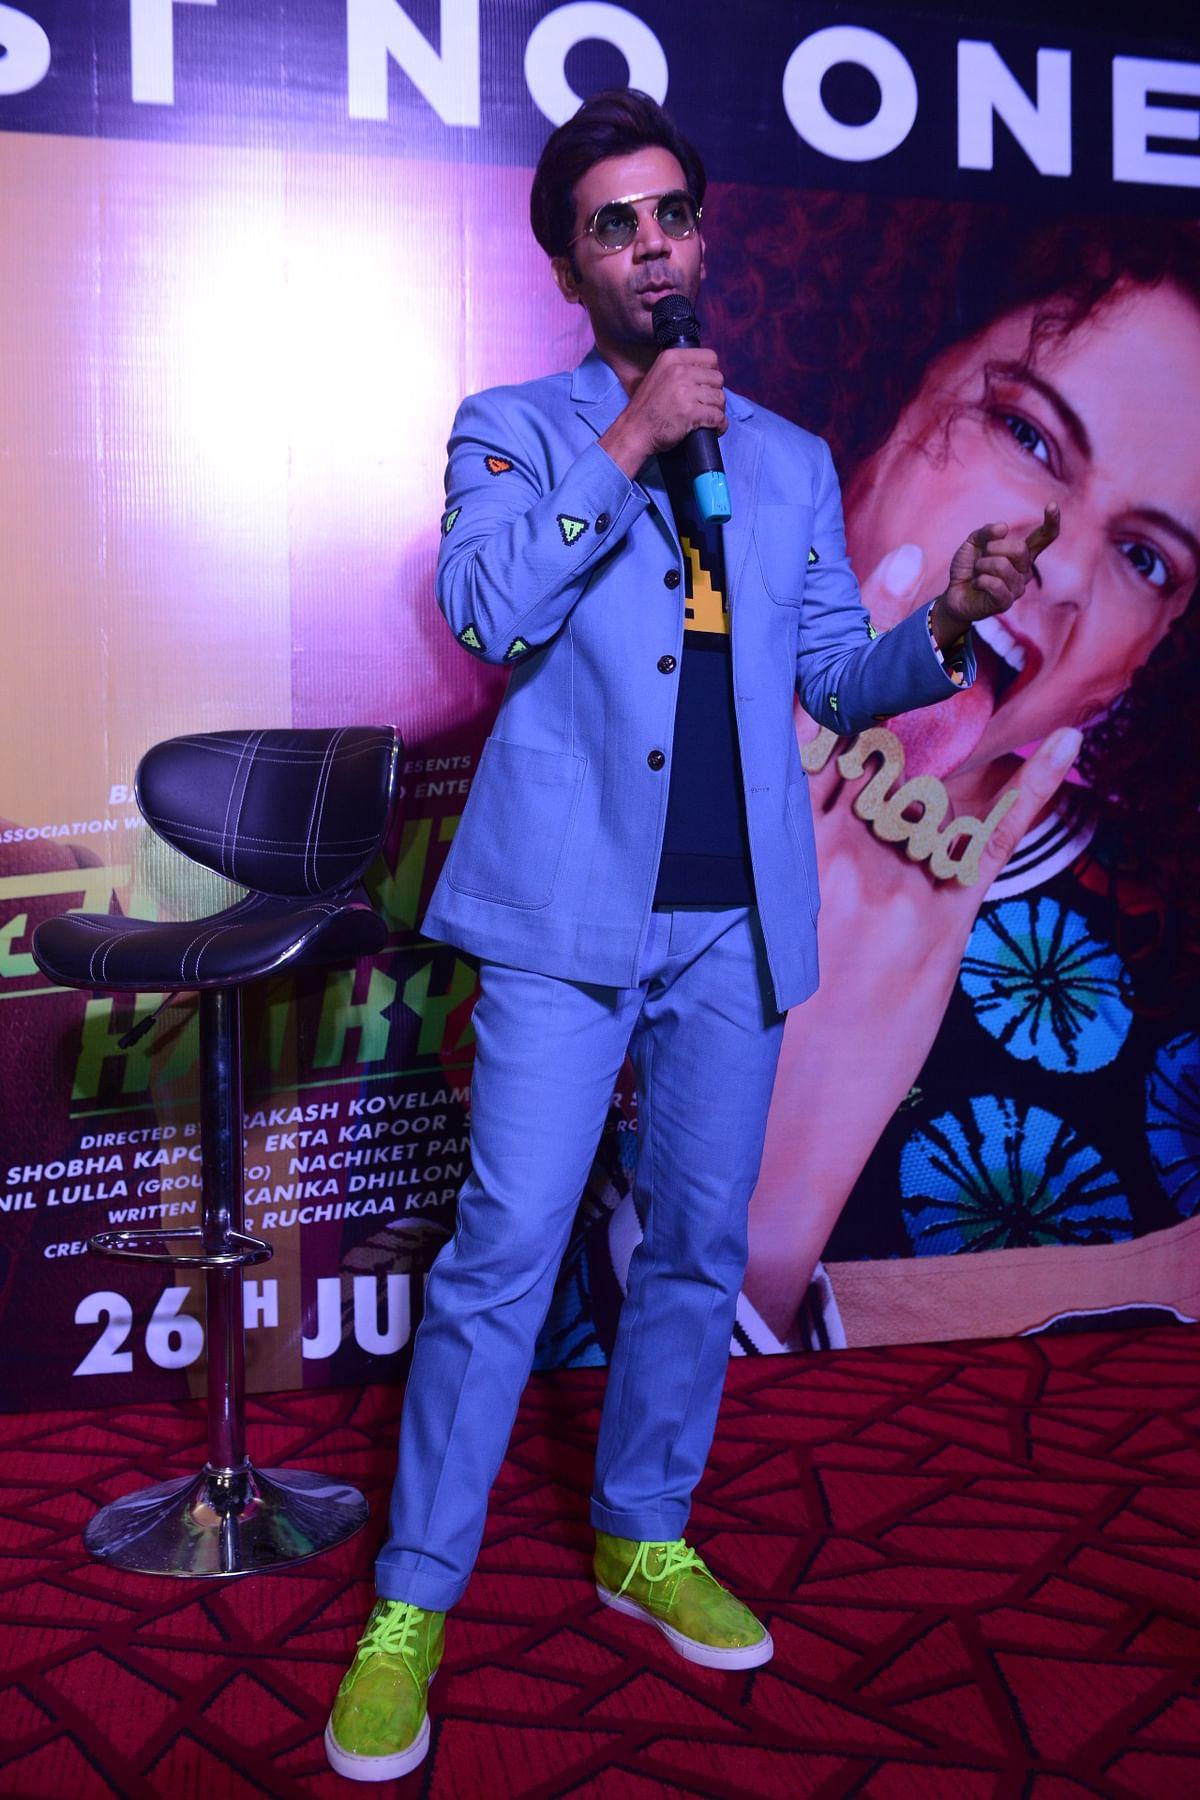 Rajkumar Rao at 'Judgementall Hai Kya' event in Delhi.